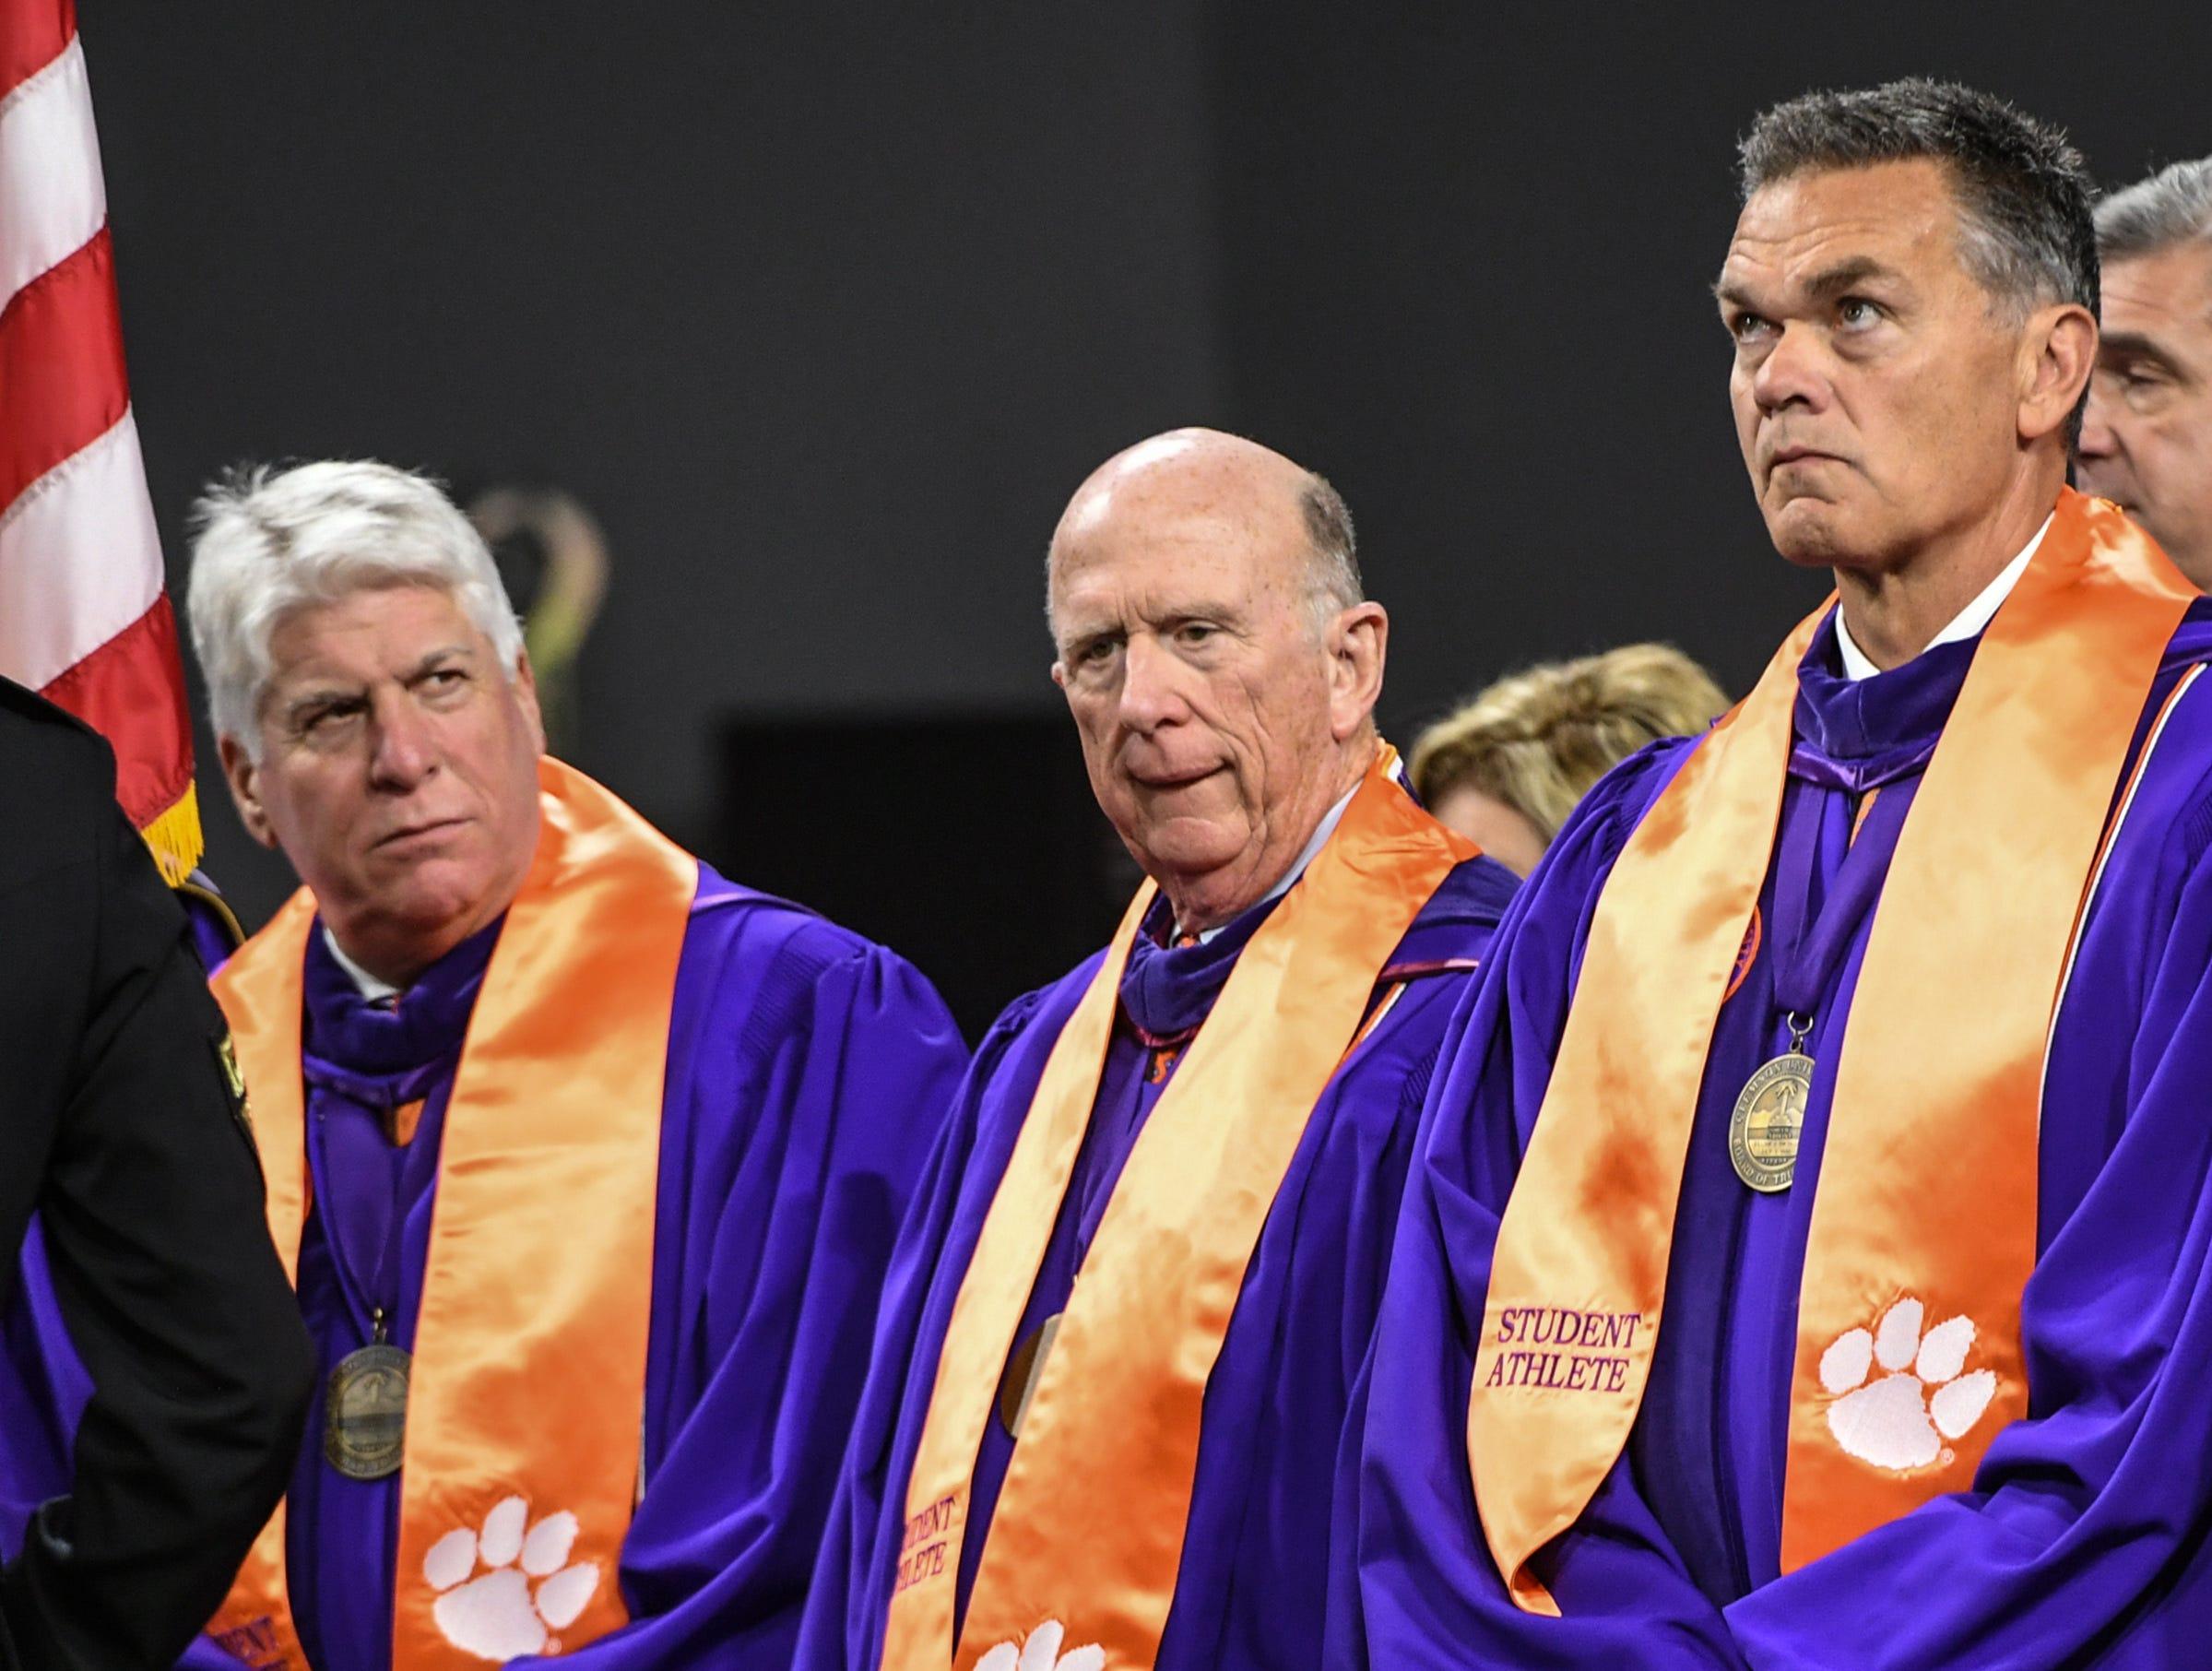 Clemson University Board of Trustees members, from left; John N. (Nicky) McCarter, Jr., David Wilkins, and William C. Smith, Jr., during Clemson University commencement ceremonies in Littlejohn Coliseum in Clemson Friday, May 10, 2019.